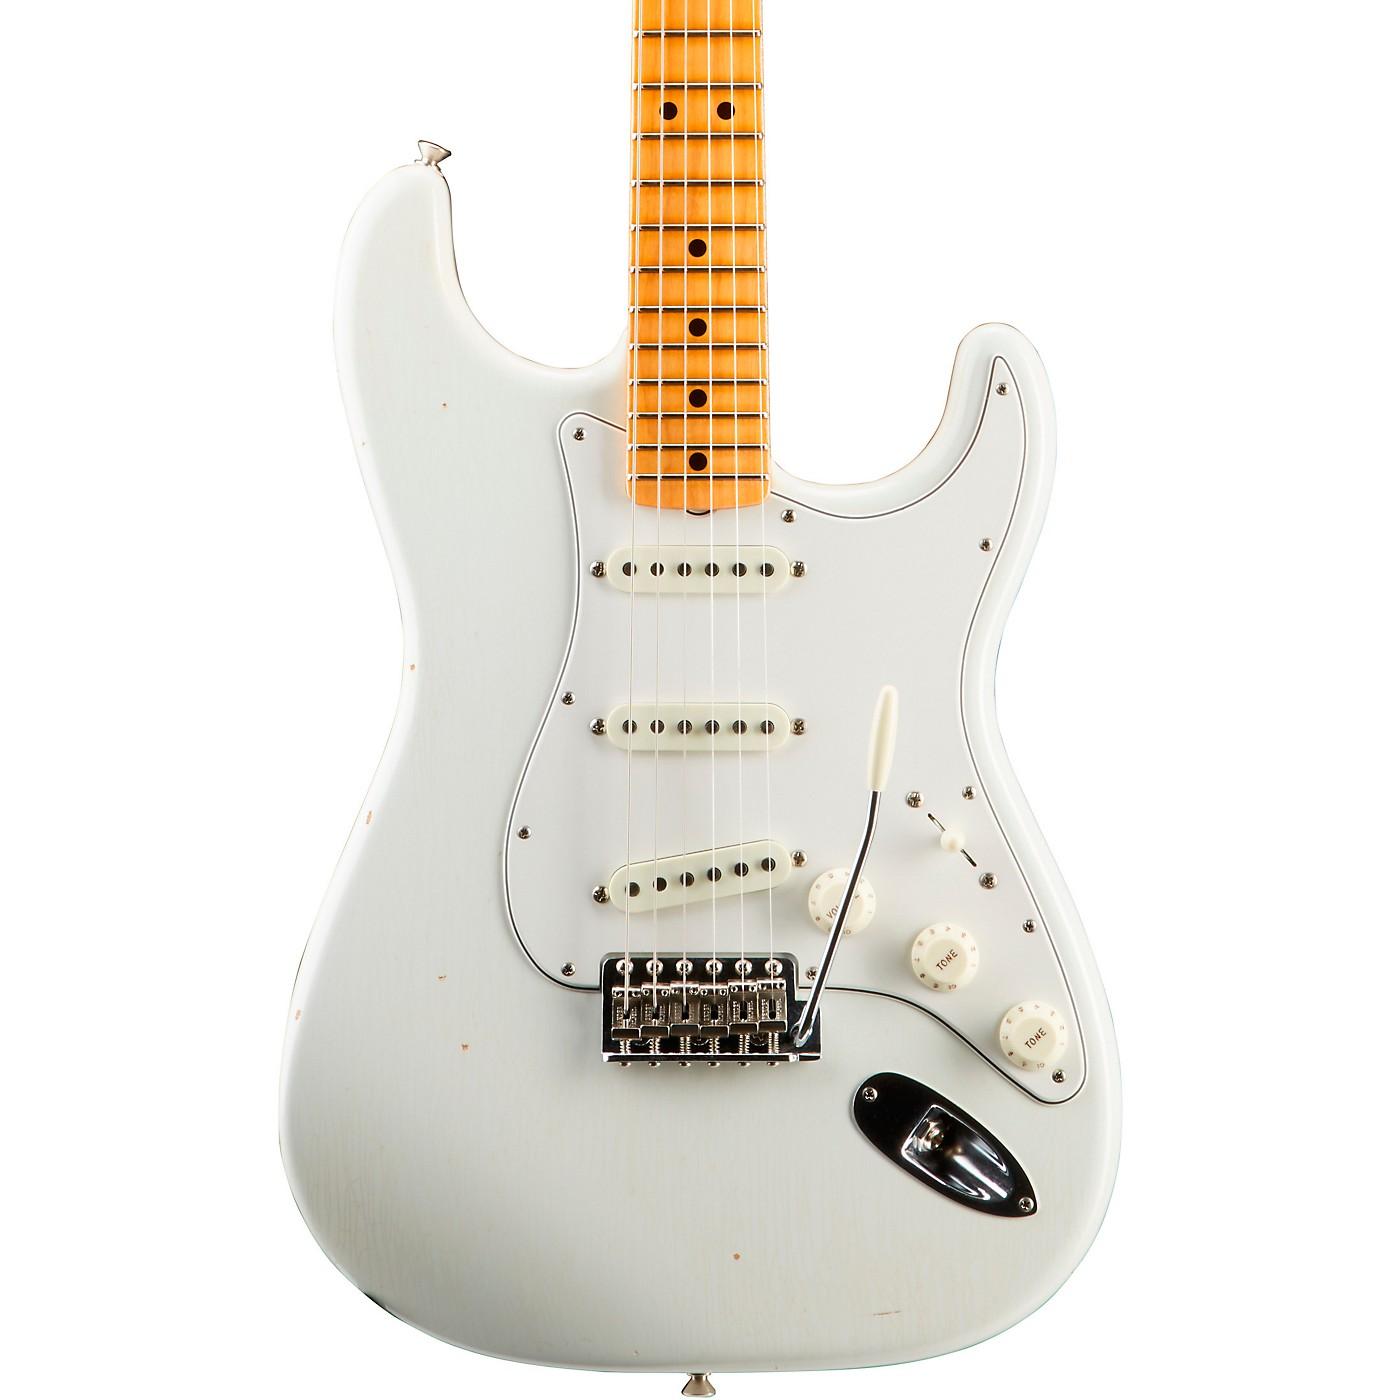 Fender Custom Shop Jimi Hendrix Voodoo Child Journeyman Relic Stratocaster Electric Guitar thumbnail